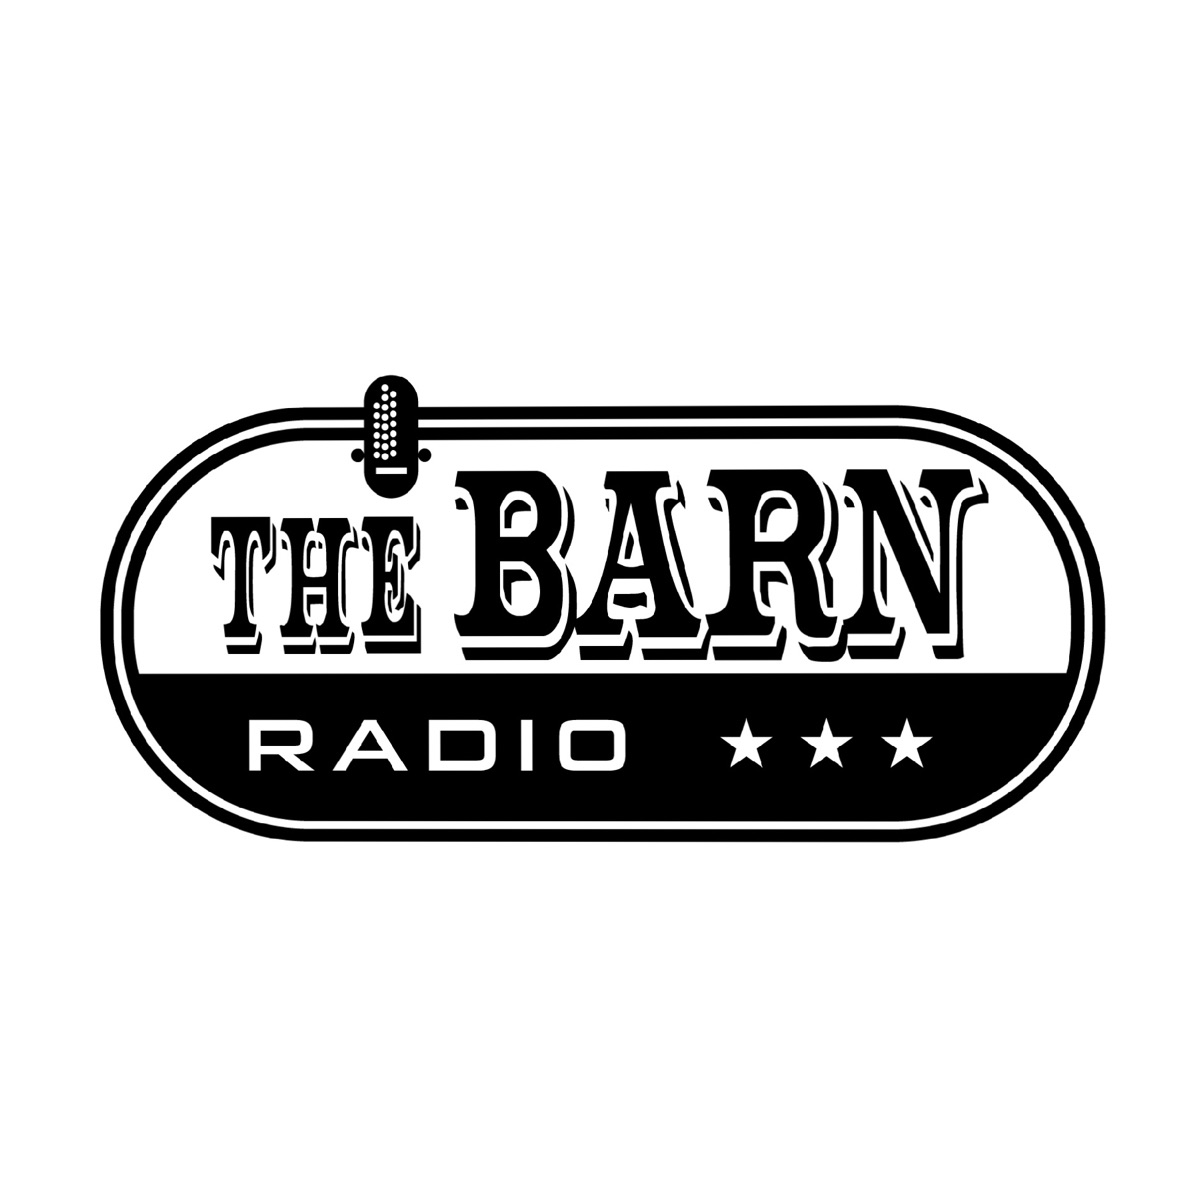 THE BARN RADIO